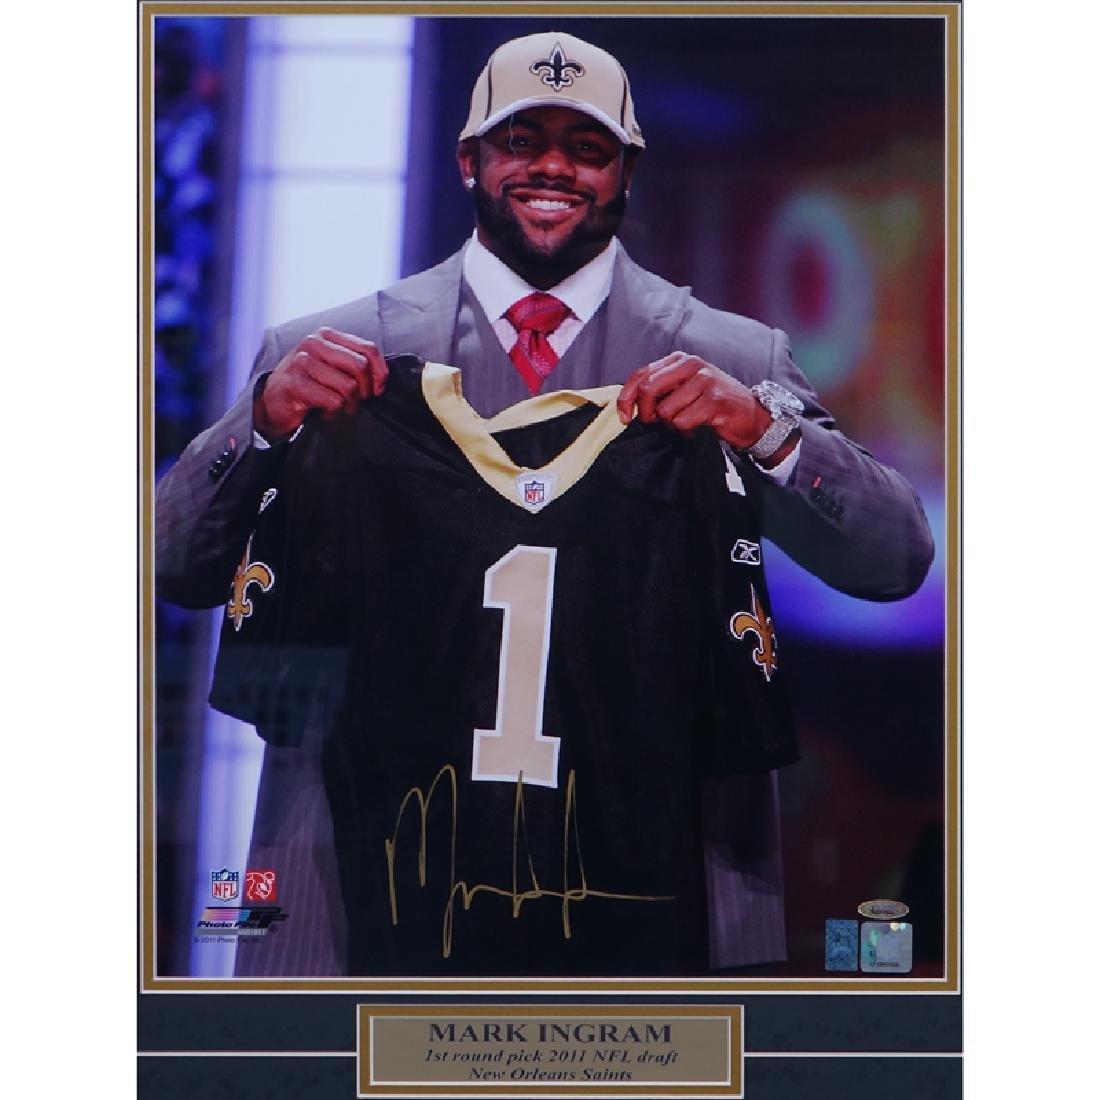 Framed and Hand Signed Mark Ingram NFL Draft Photo.